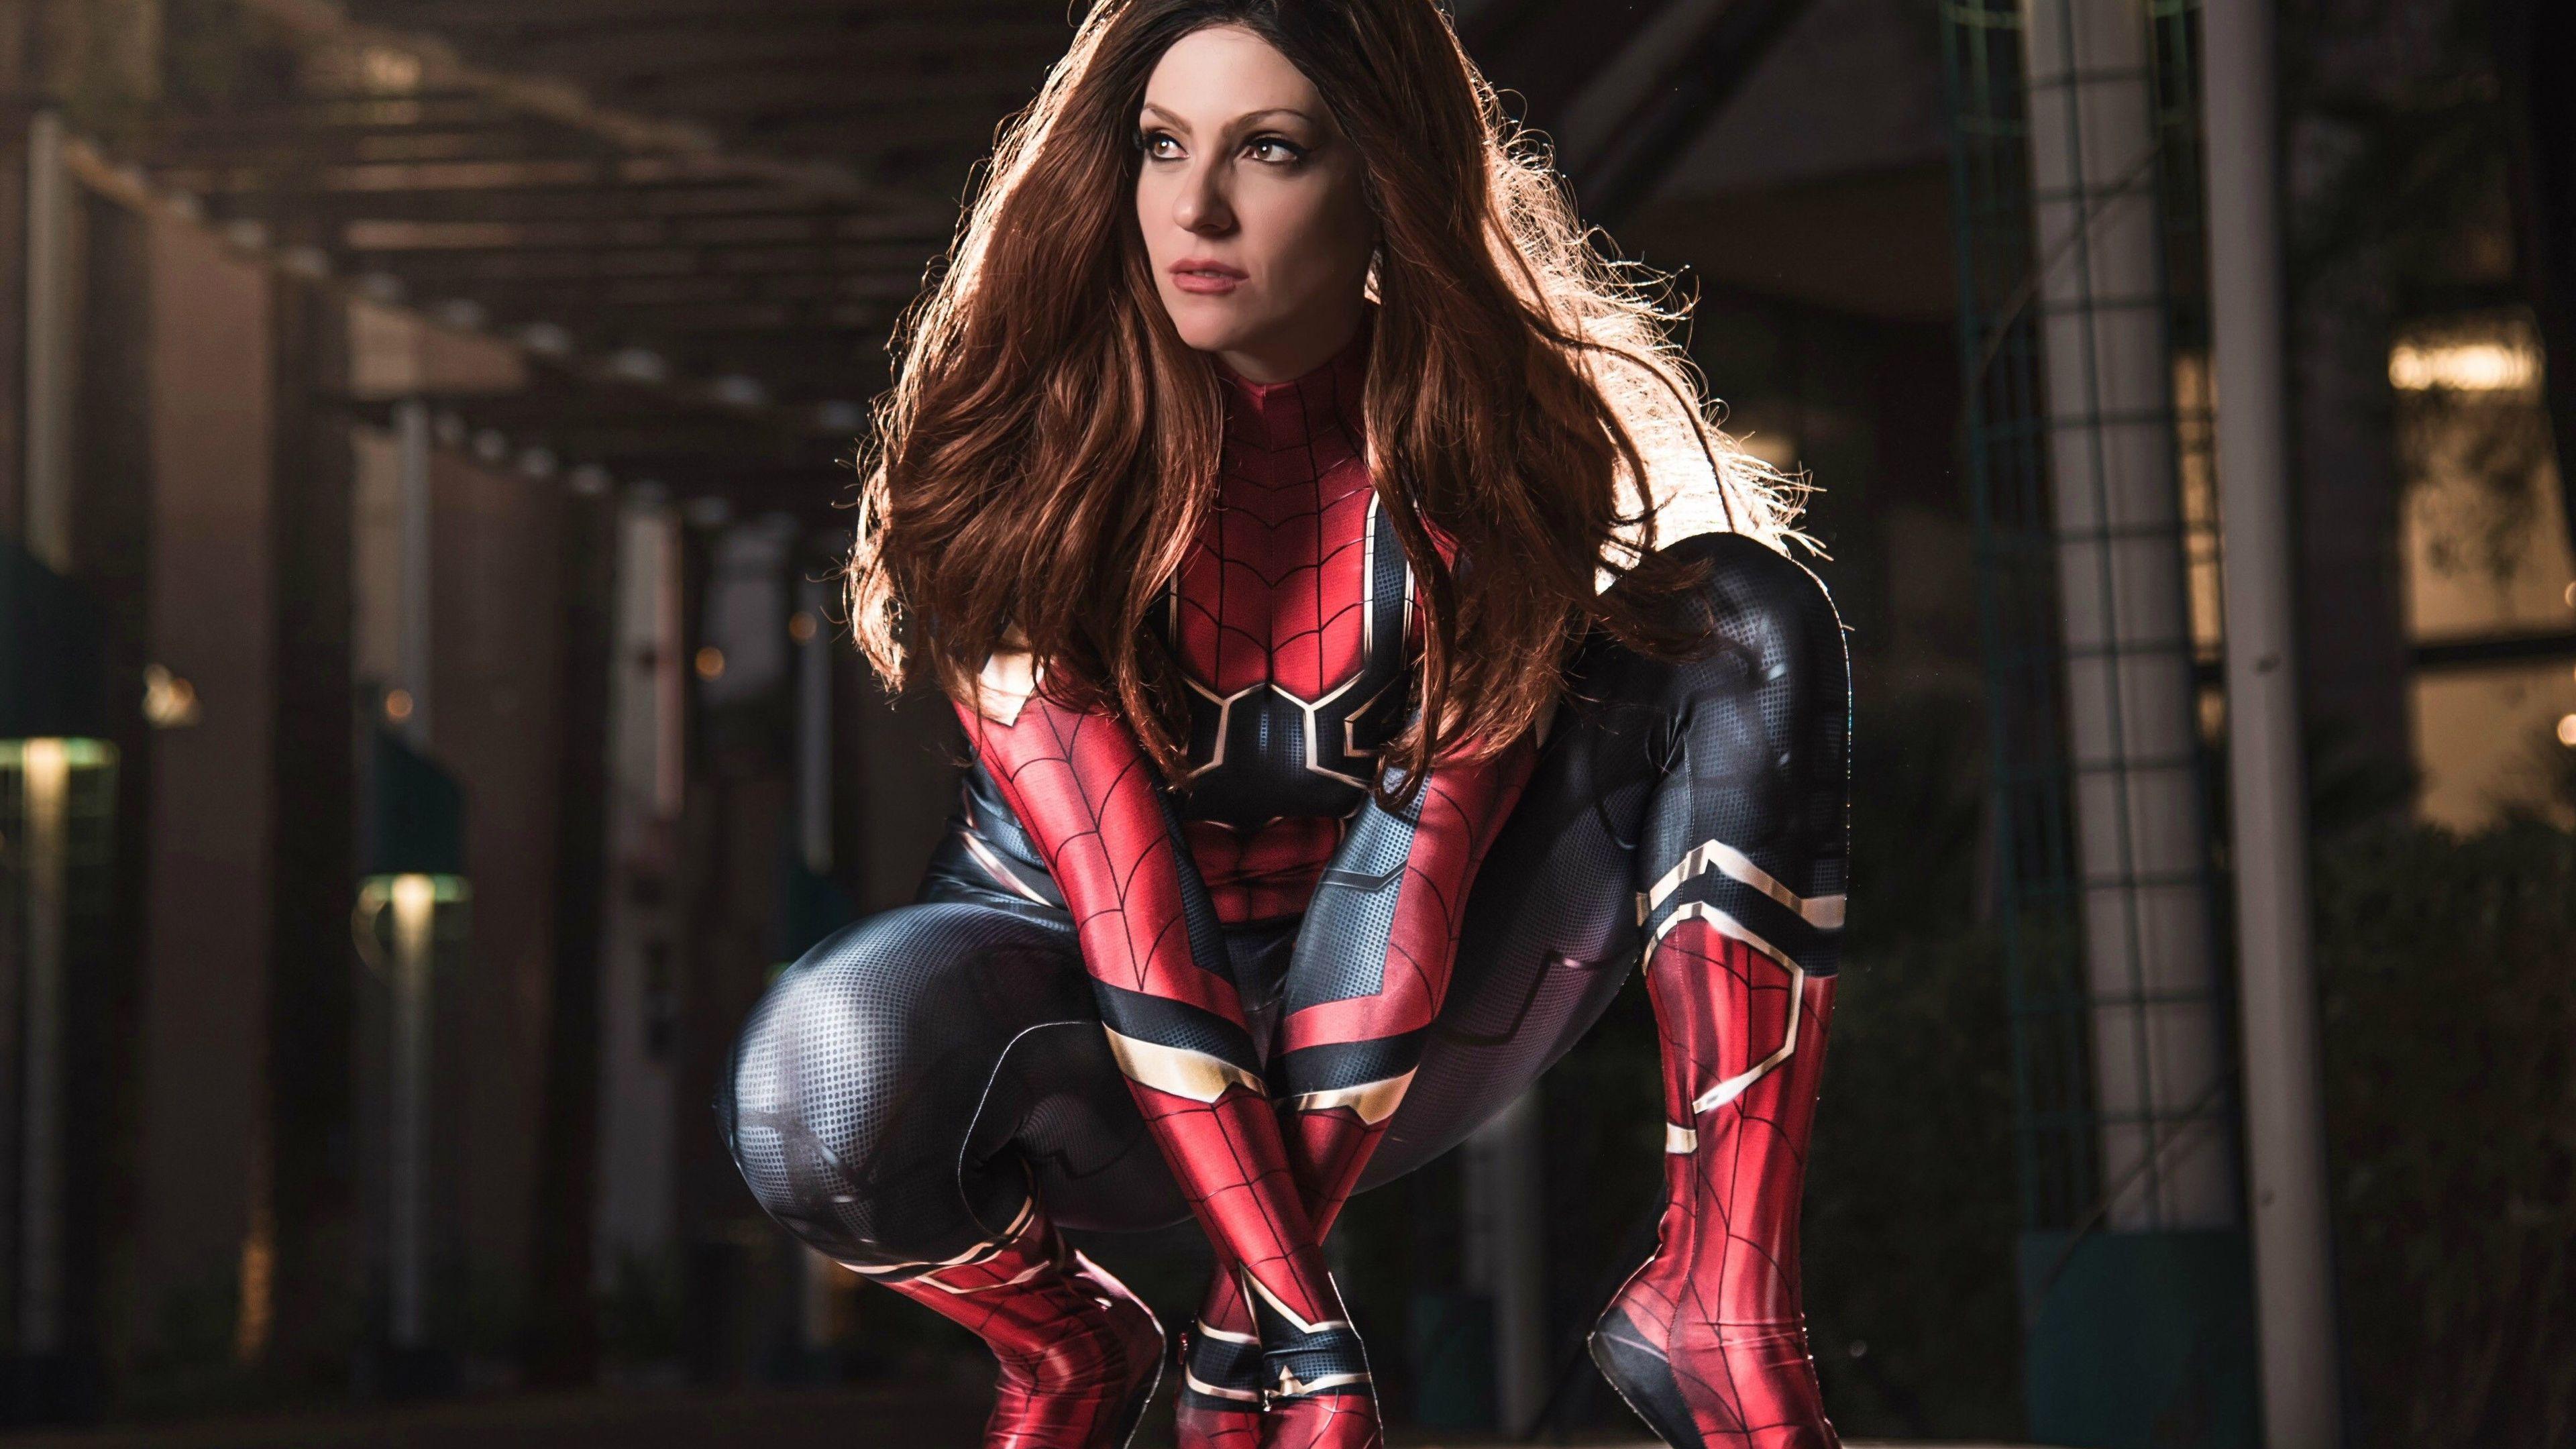 spider girl 4k 1547506391 - Spider Girl 4k - superheroes wallpapers, spidergirl wallpapers, hd-wallpapers, 4k-wallpapers